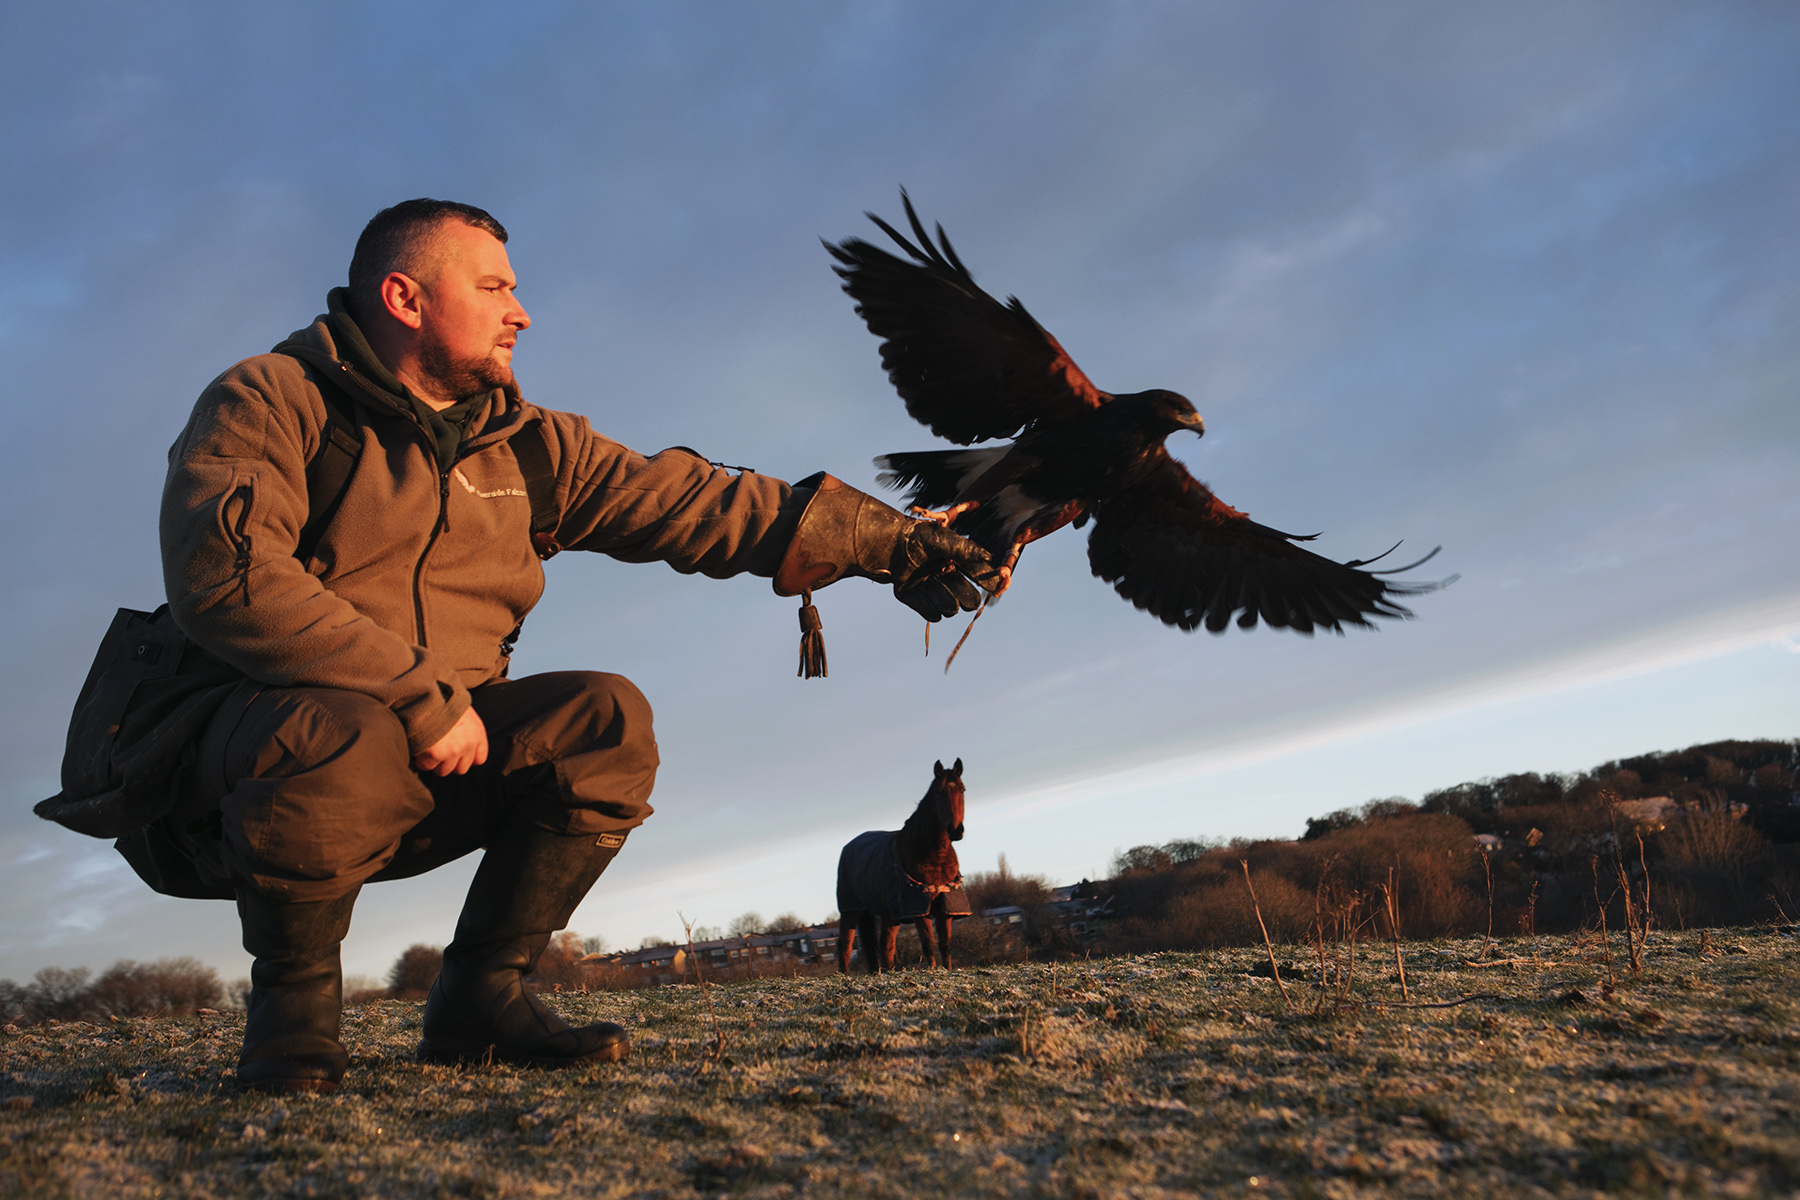 Dan Prince - Man with bird taking flight